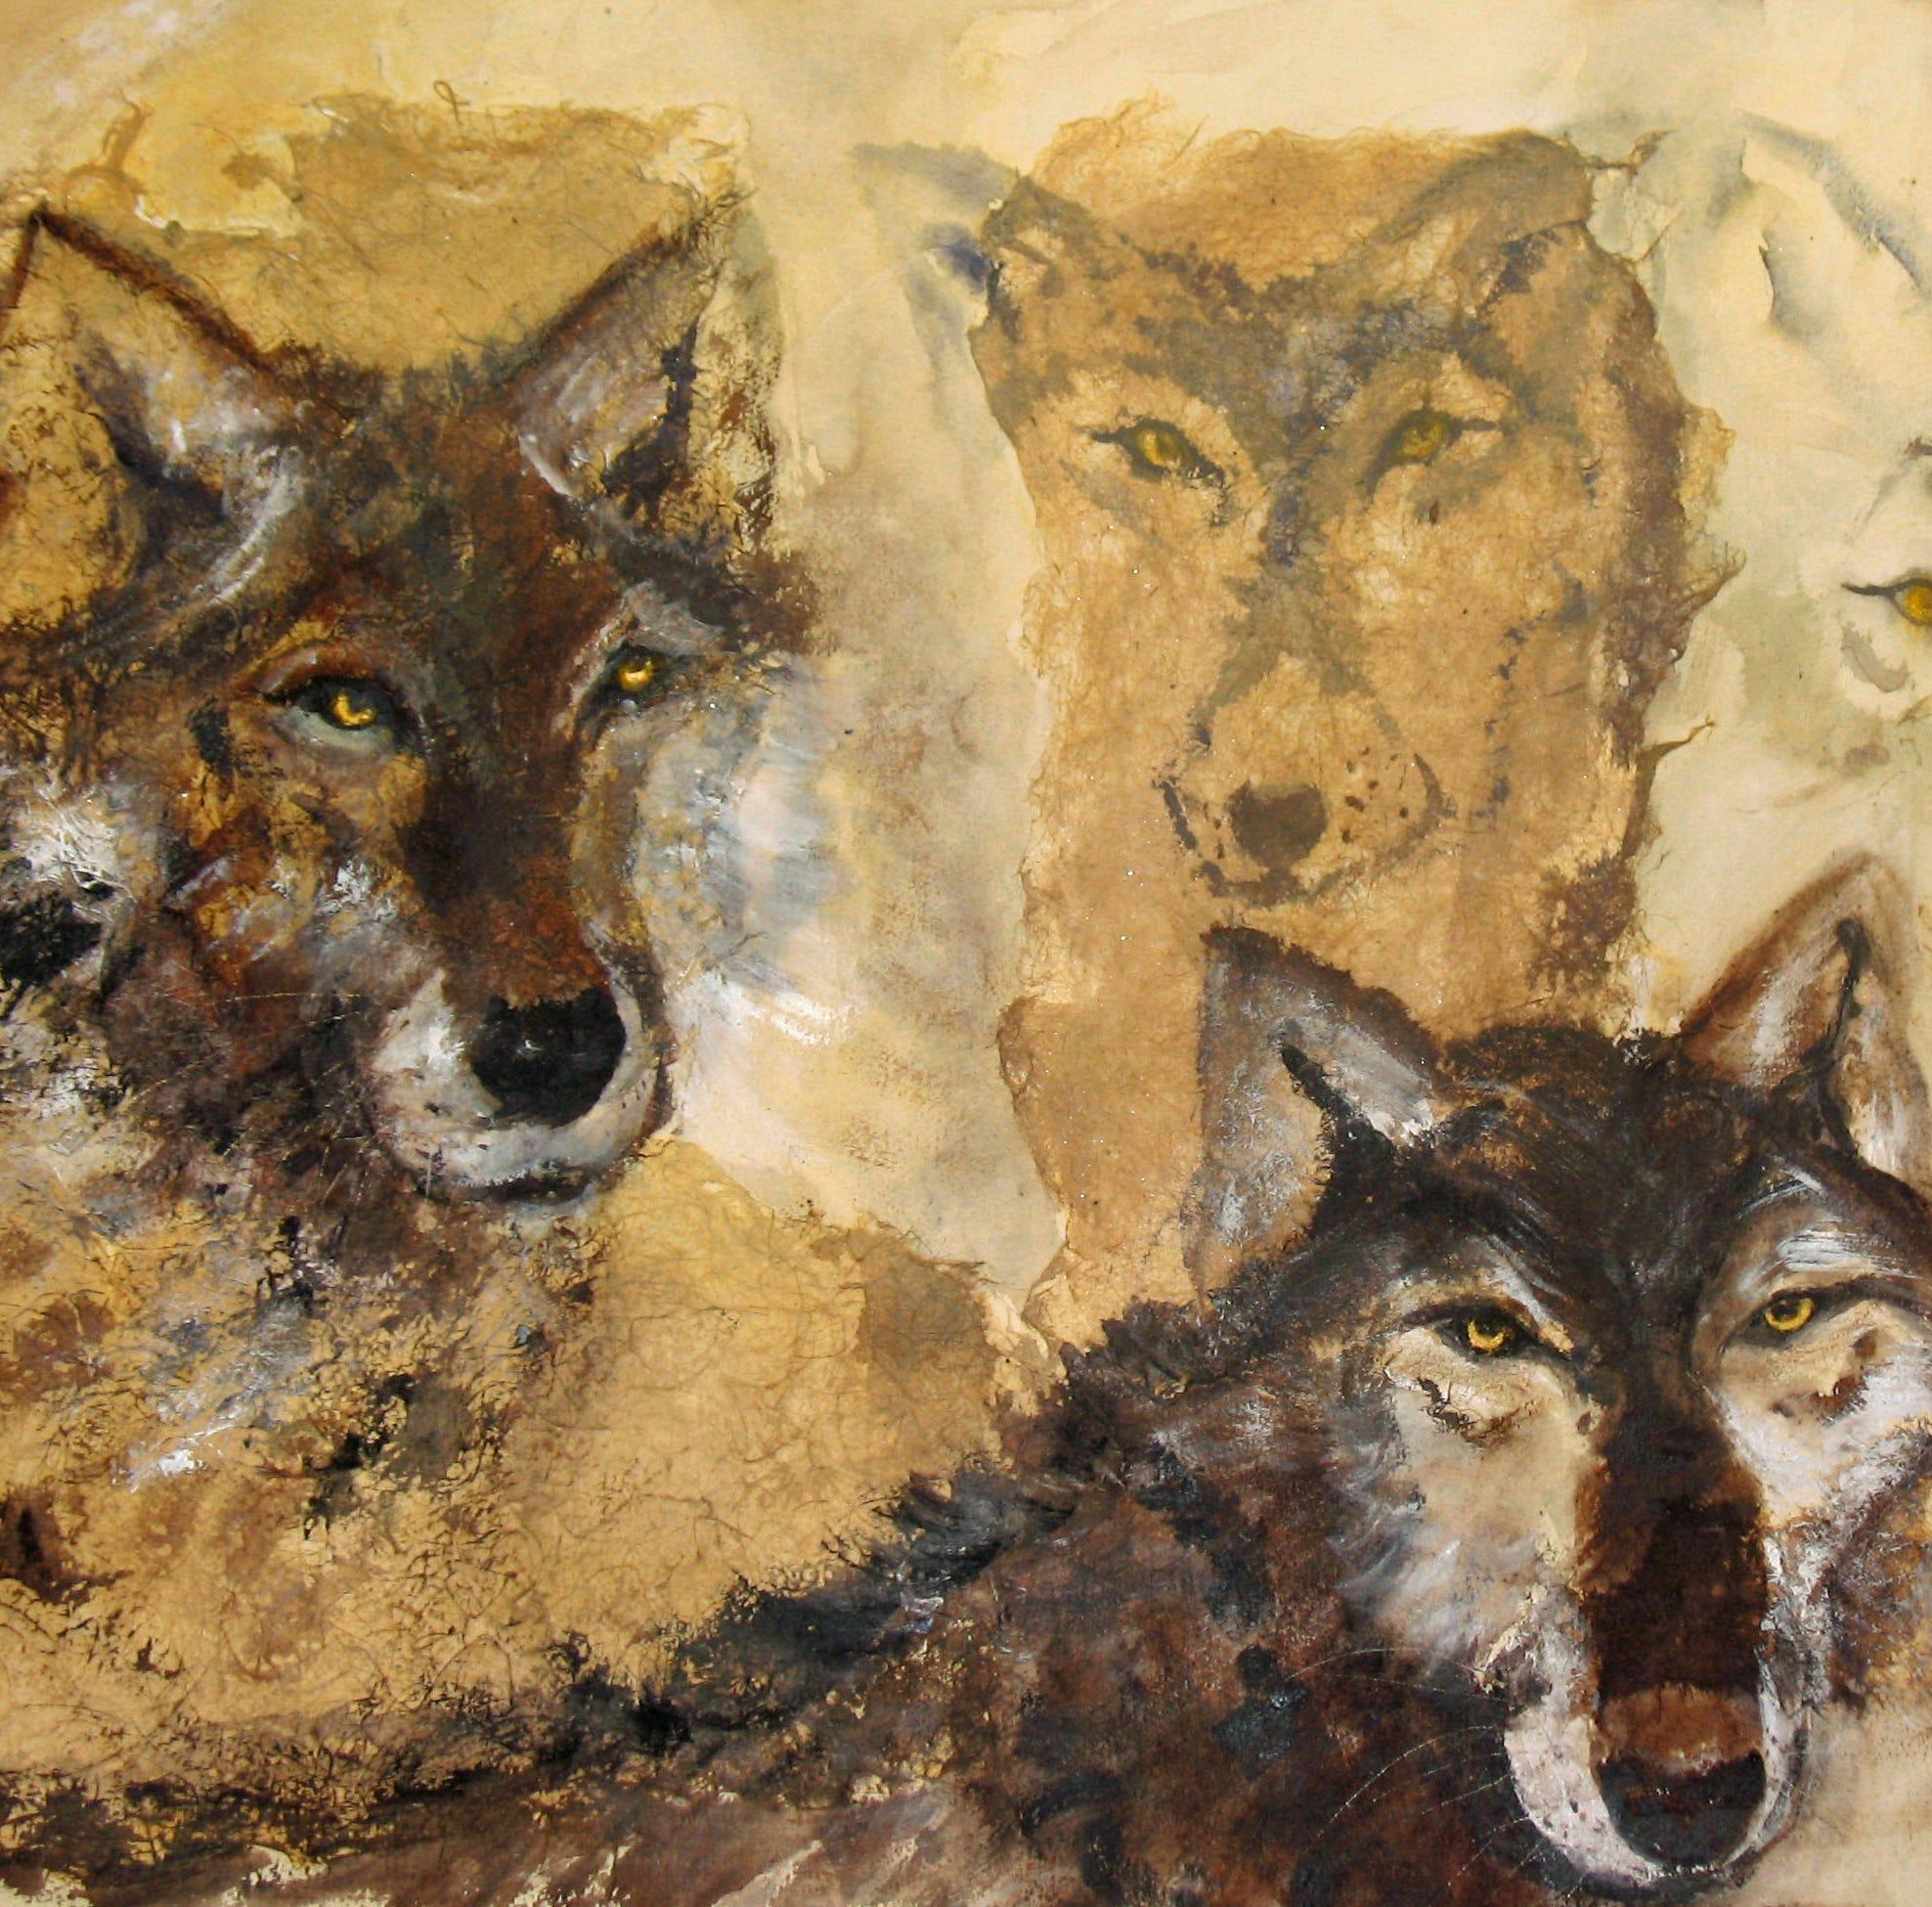 Nature Journal: Timber Wolf